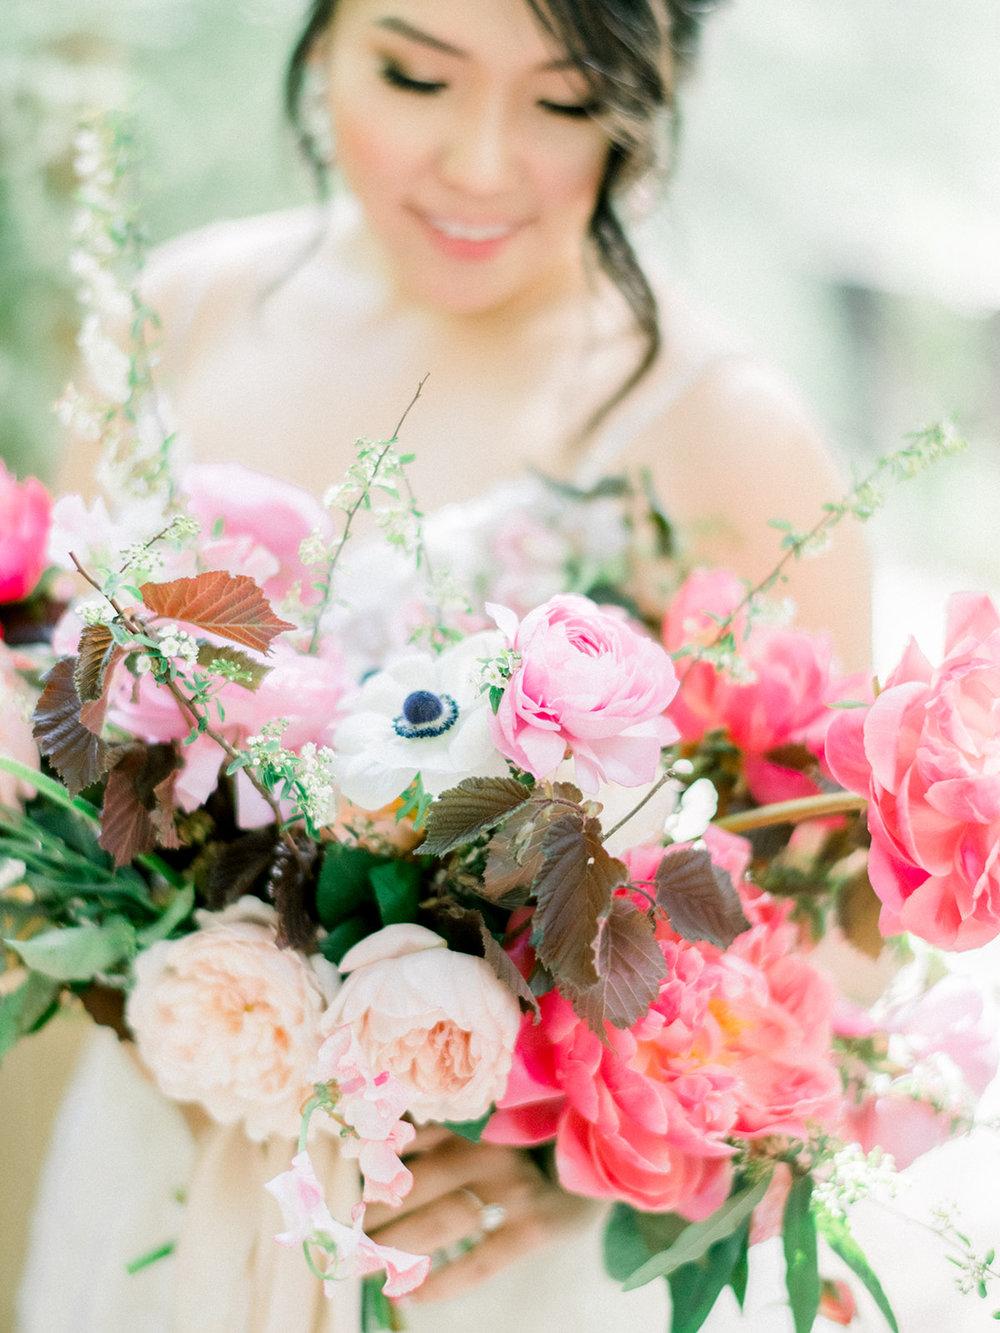 jueunandjon-etherandsmith-wedding-361.jpg